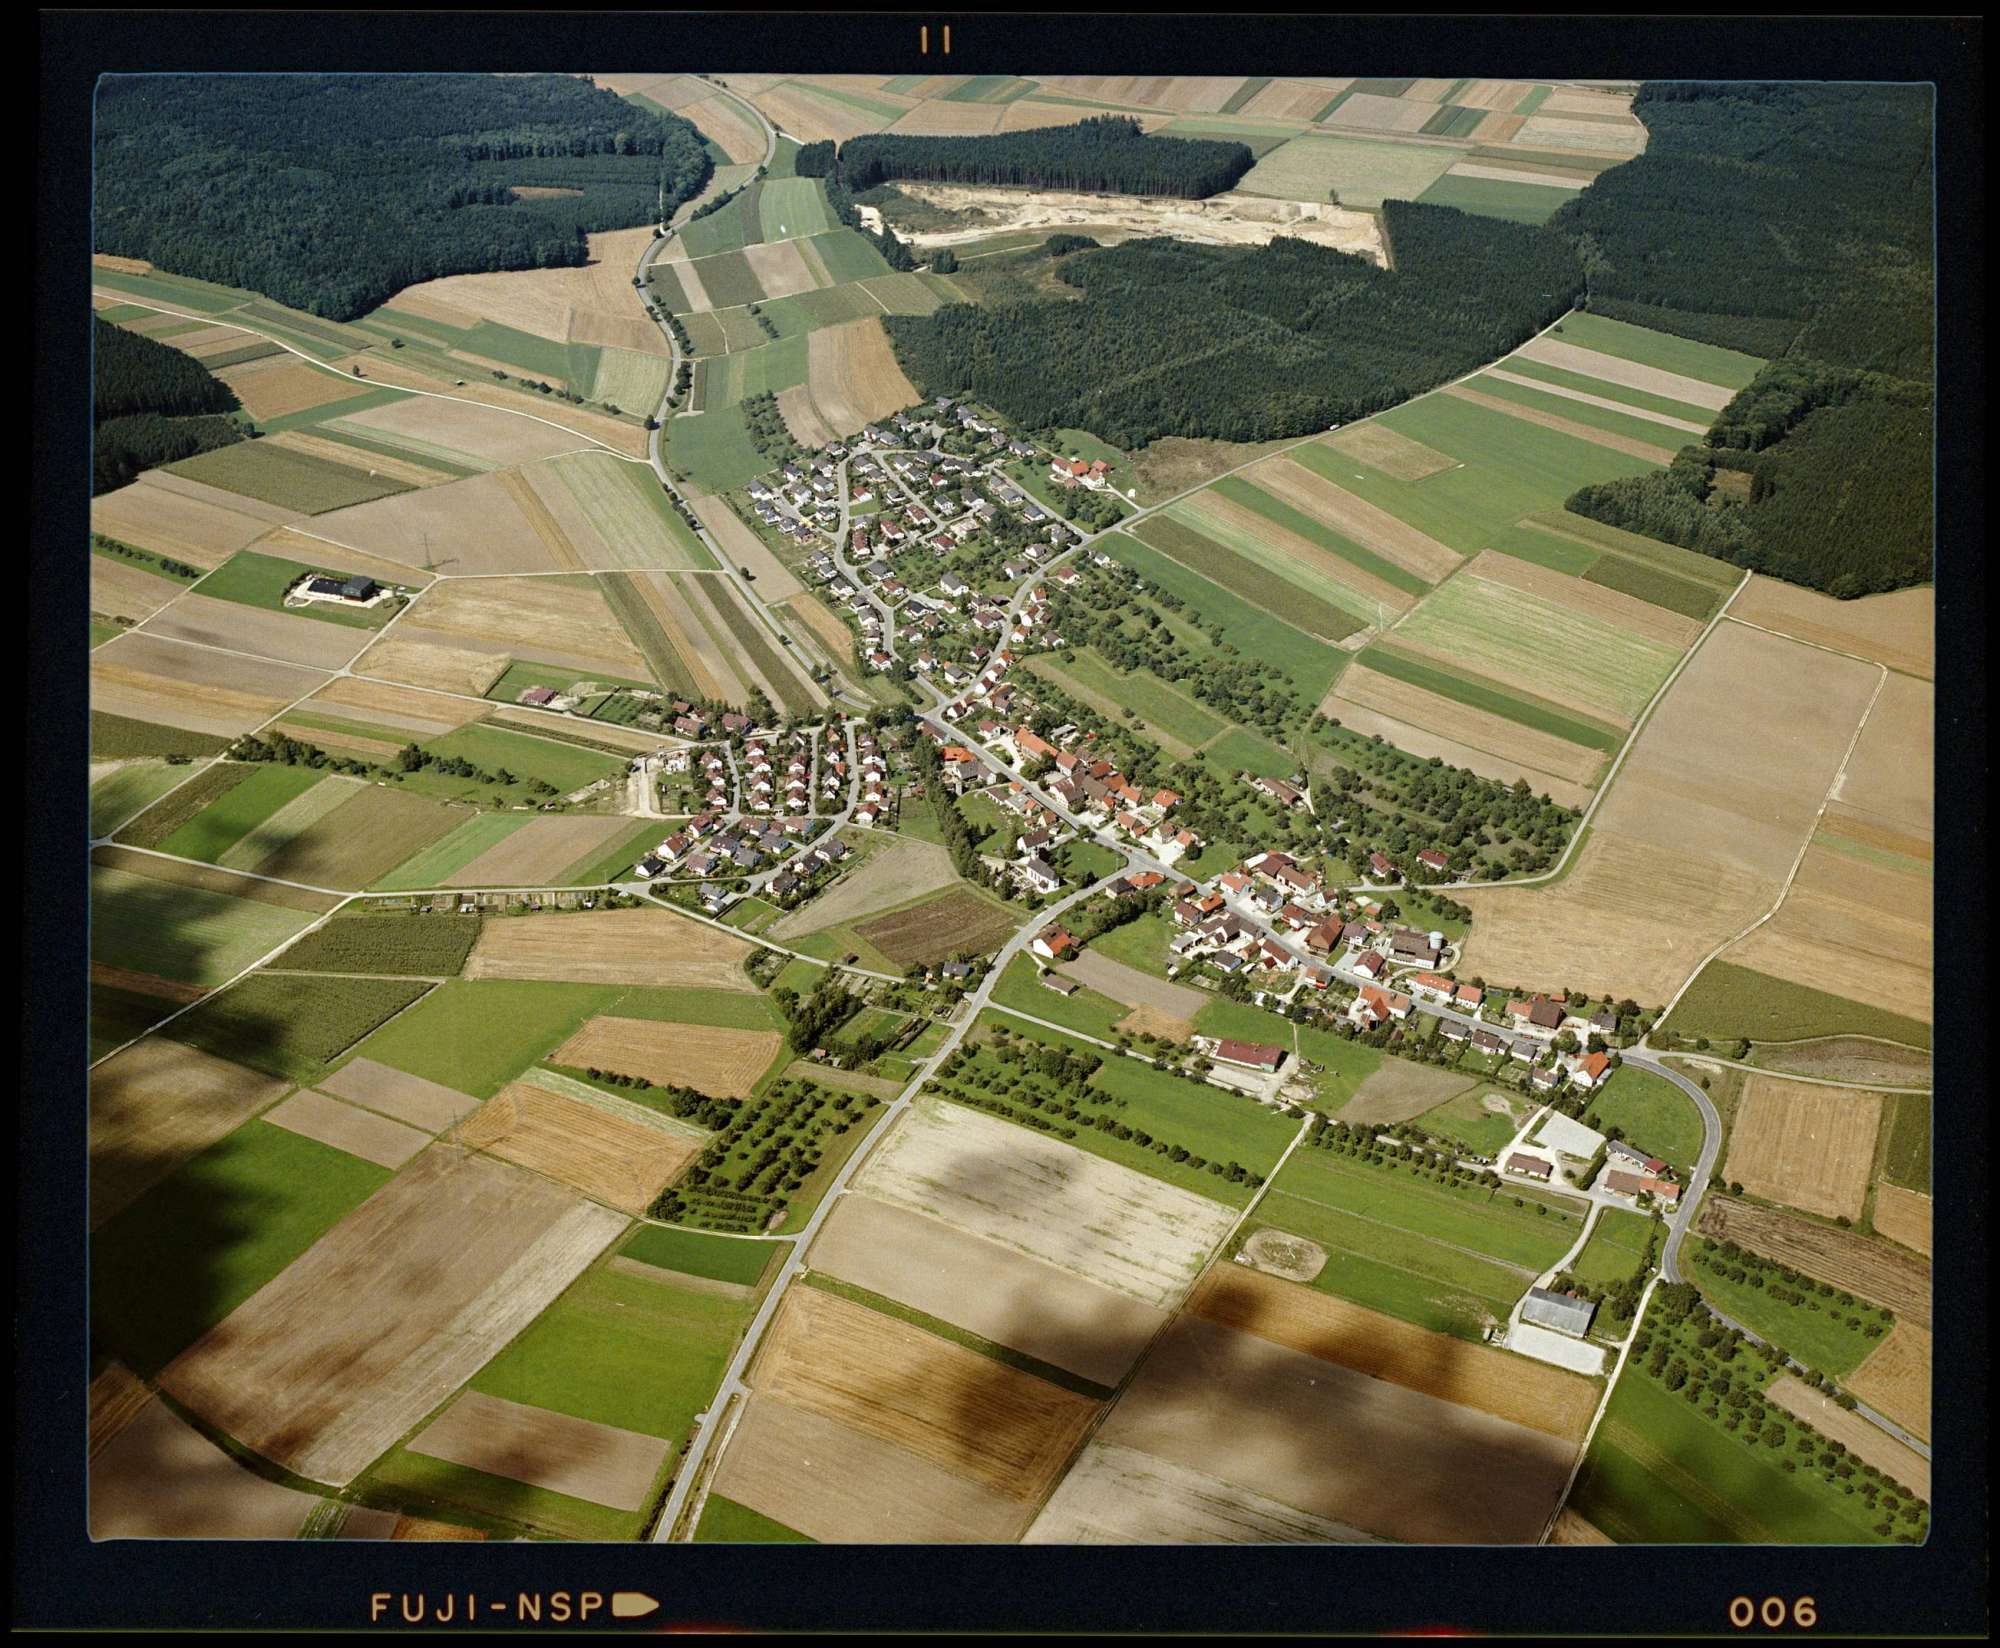 Bach, Luftbild, Bild 1